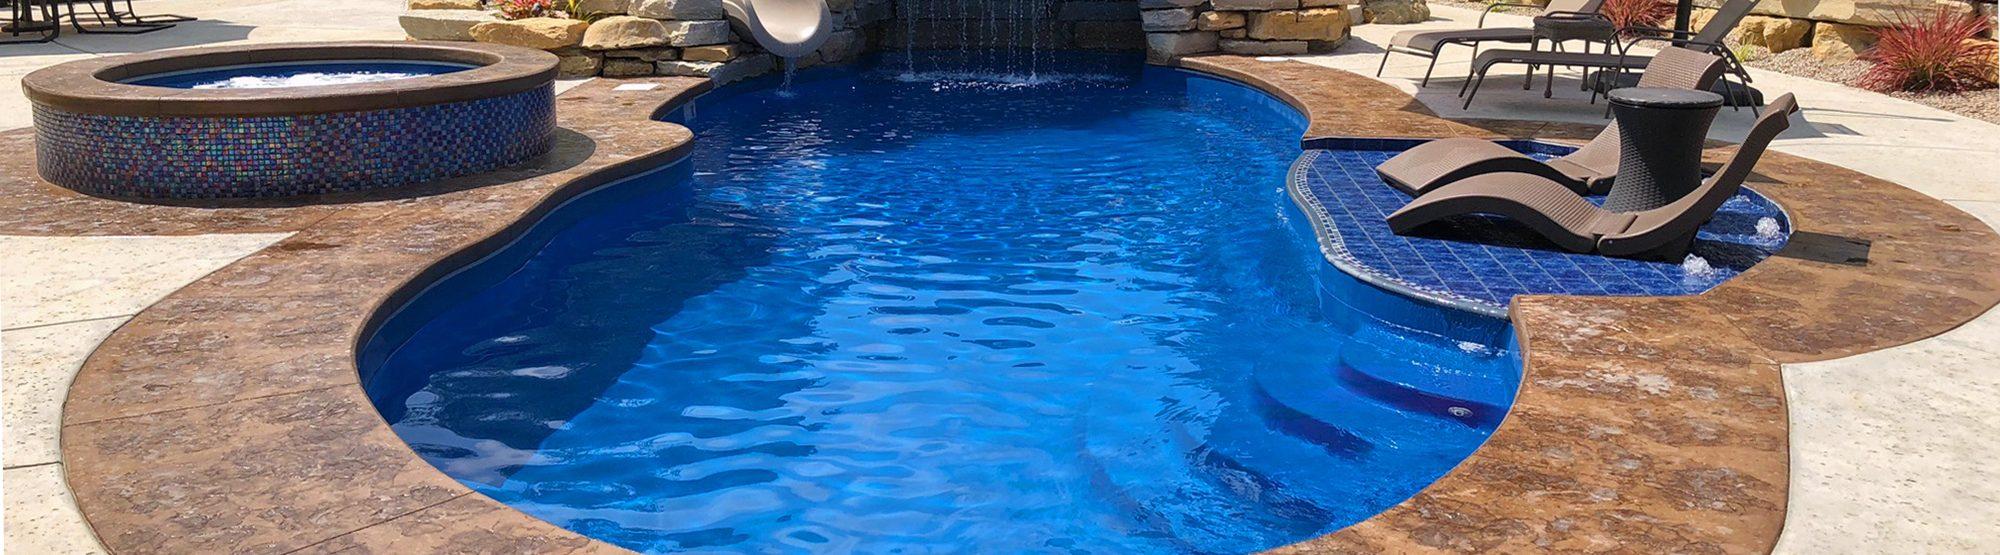 The Most Popular Inground Fiberglass Pools On The Market